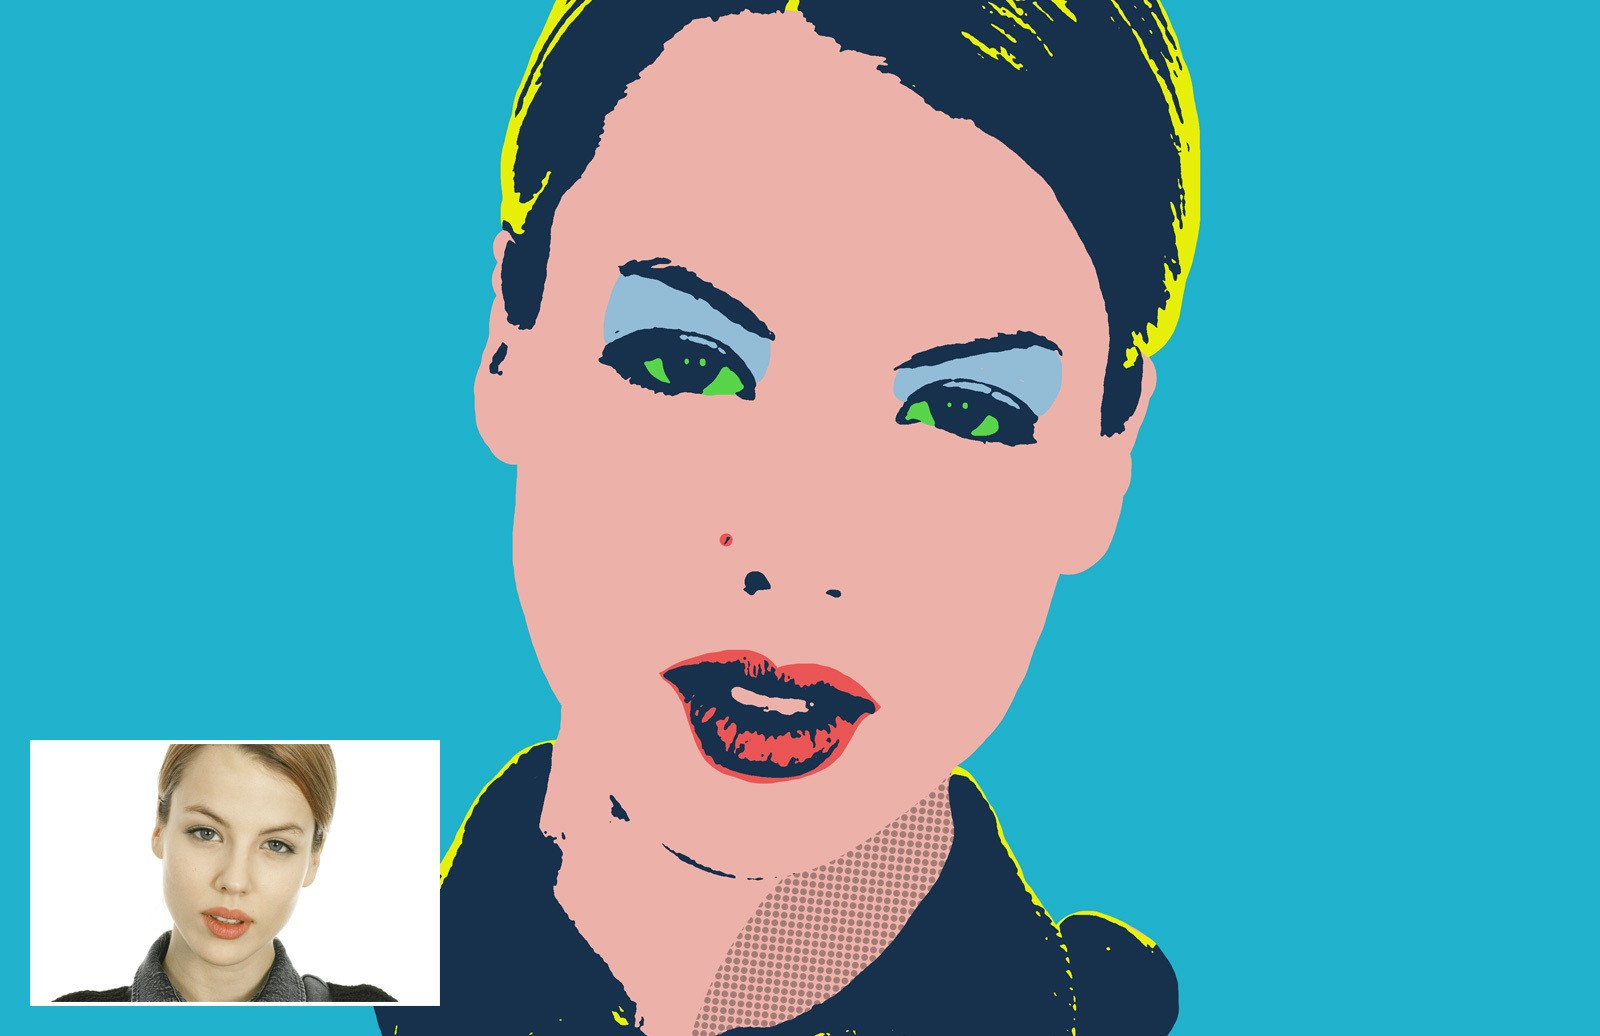 Andy Warhol Photo Effect 2